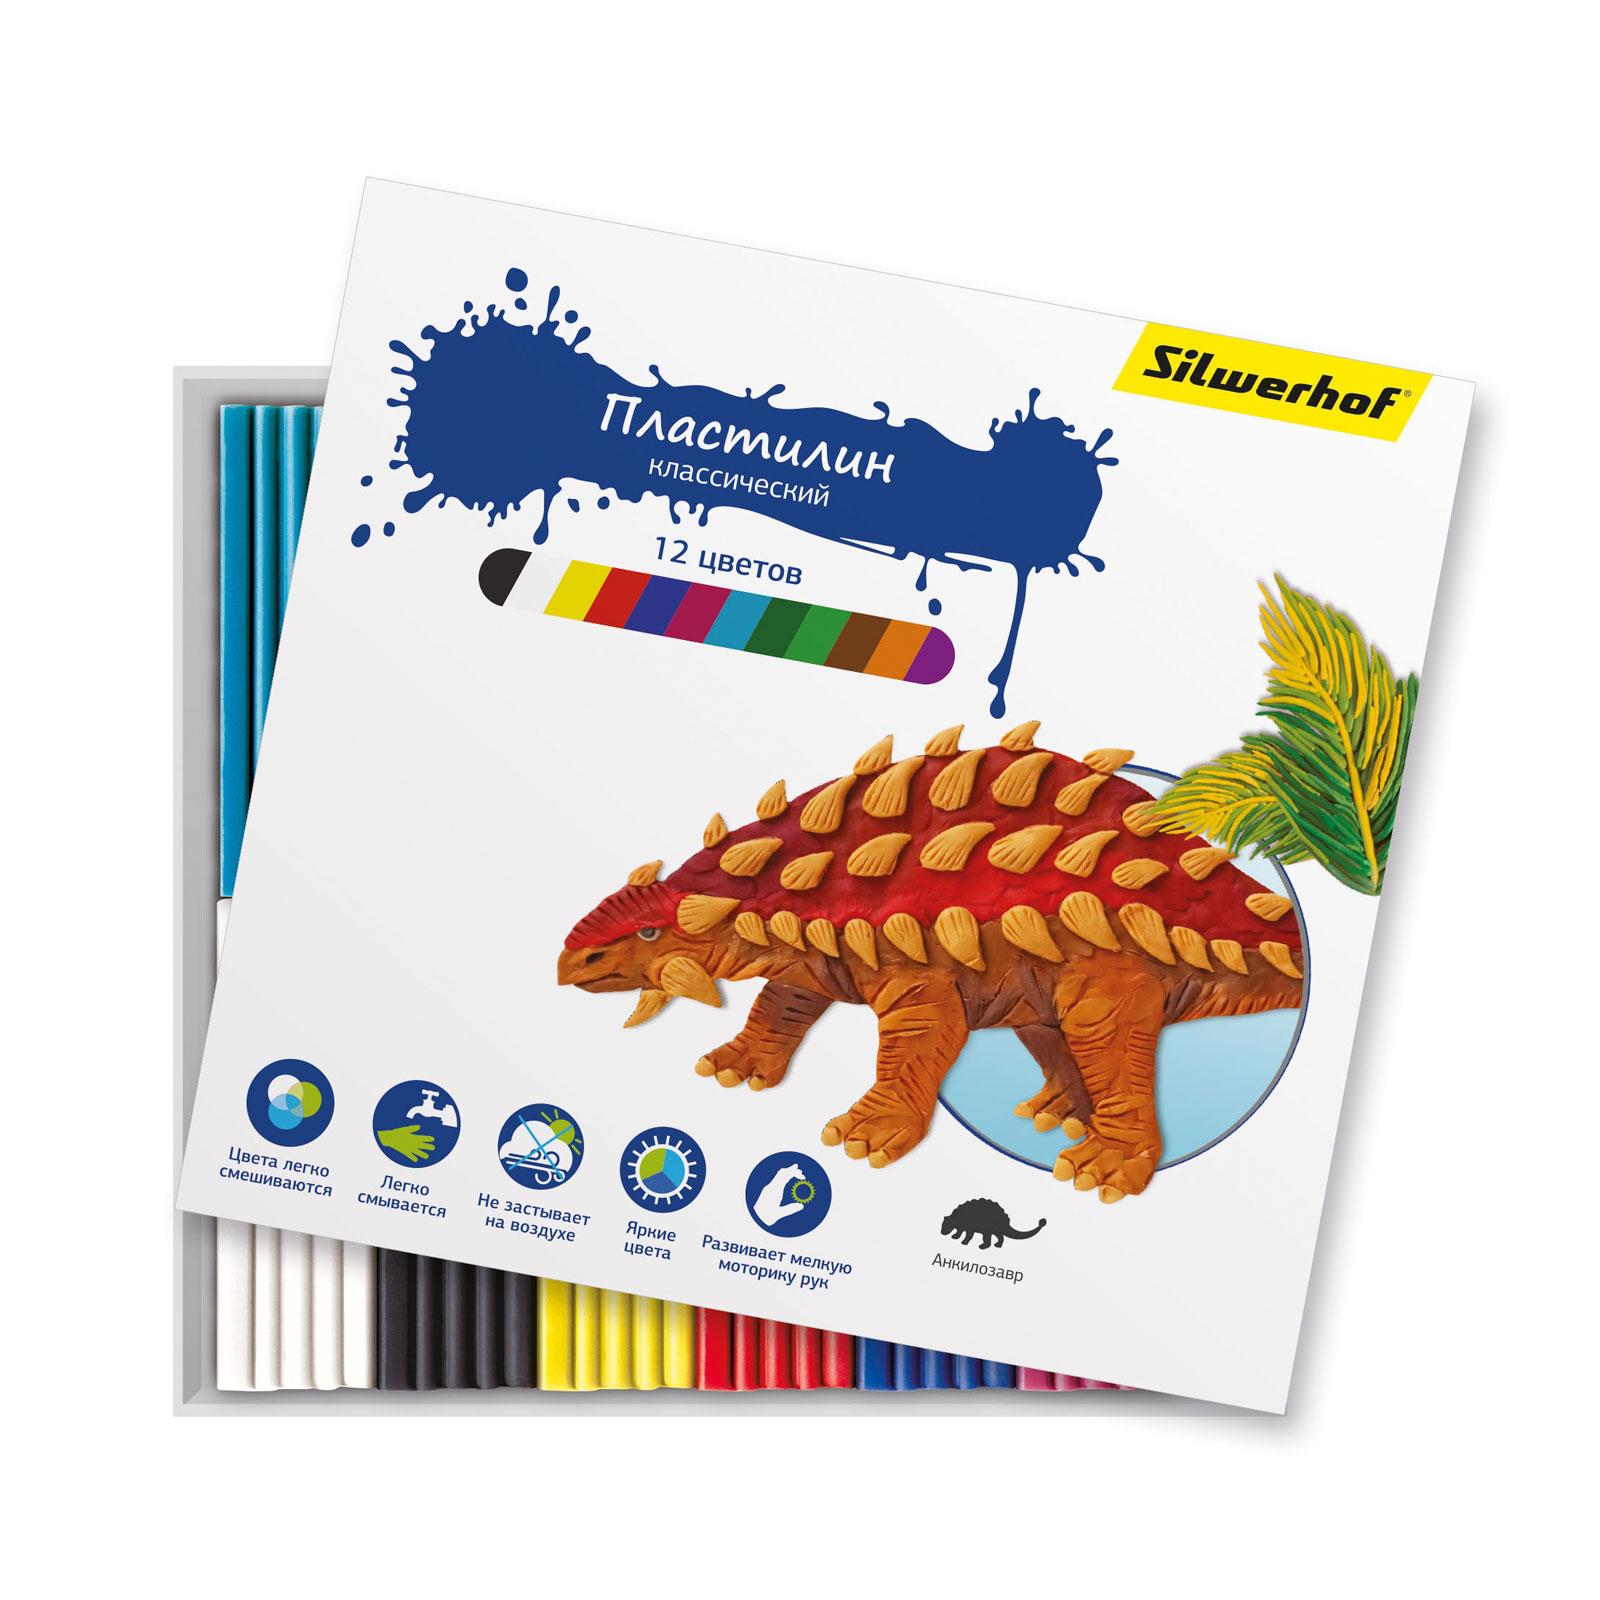 Пластилин Silwerhof 12 цветов 180 гр Динозавры<br>